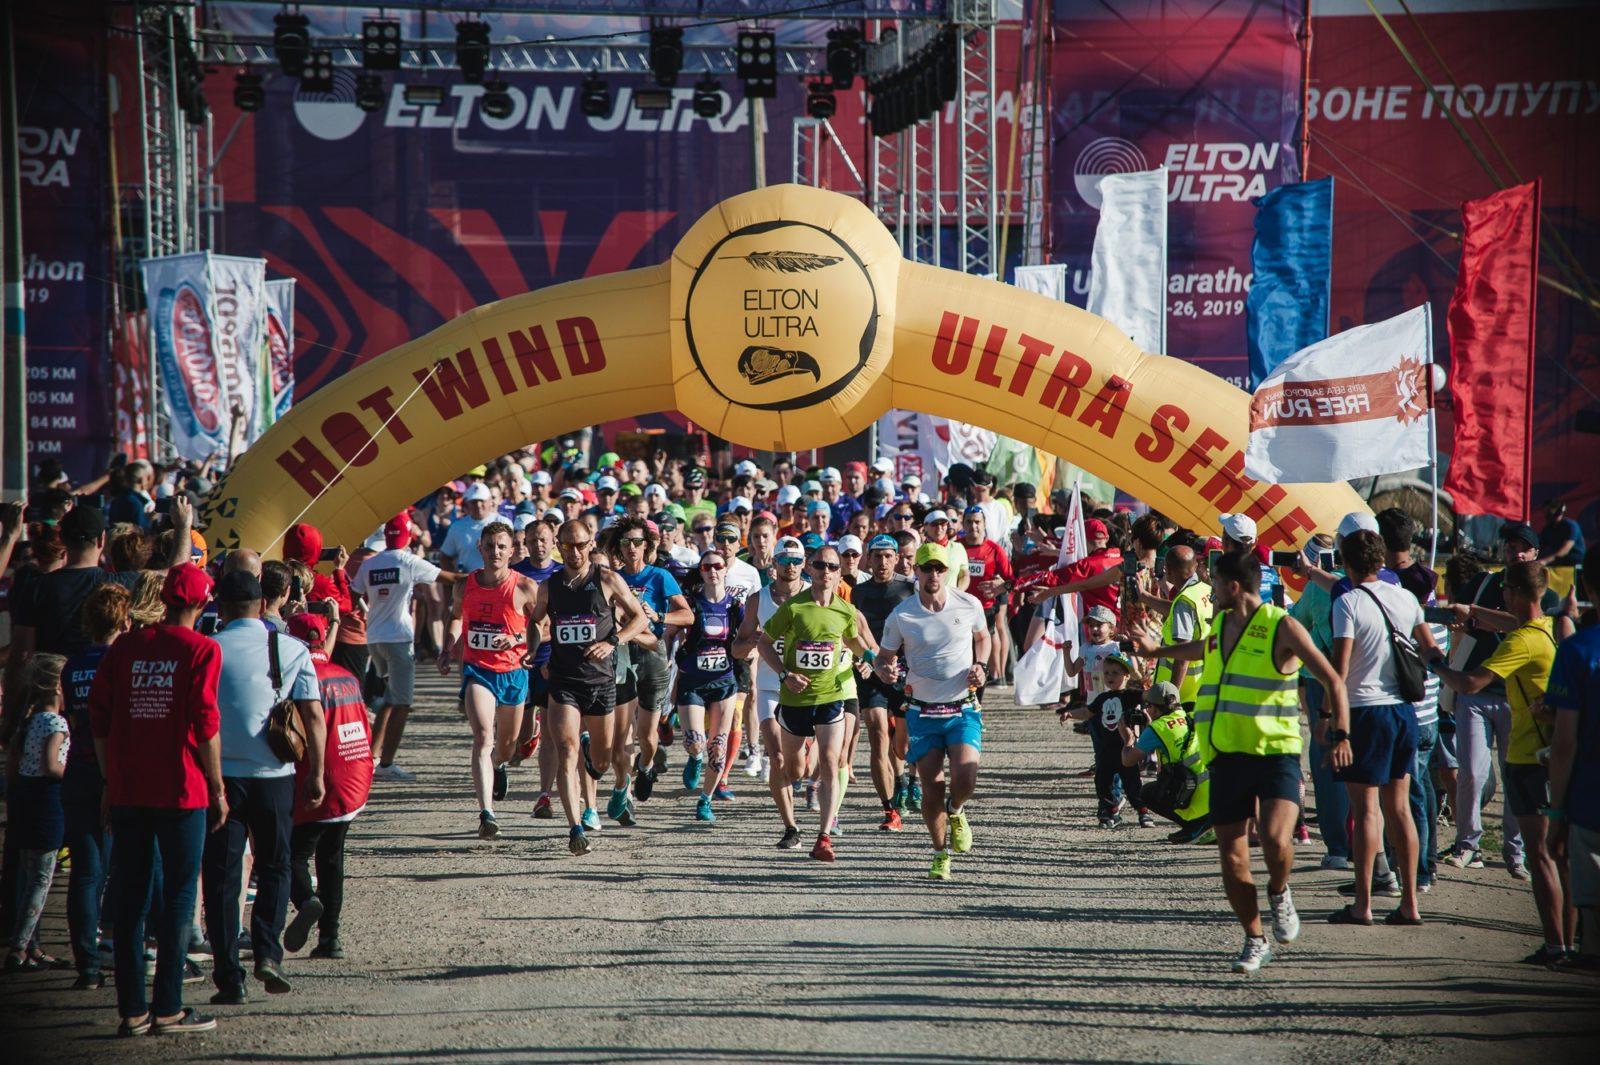 ELTON ULTRA 2019 – GAGARIN RACE 21 KM